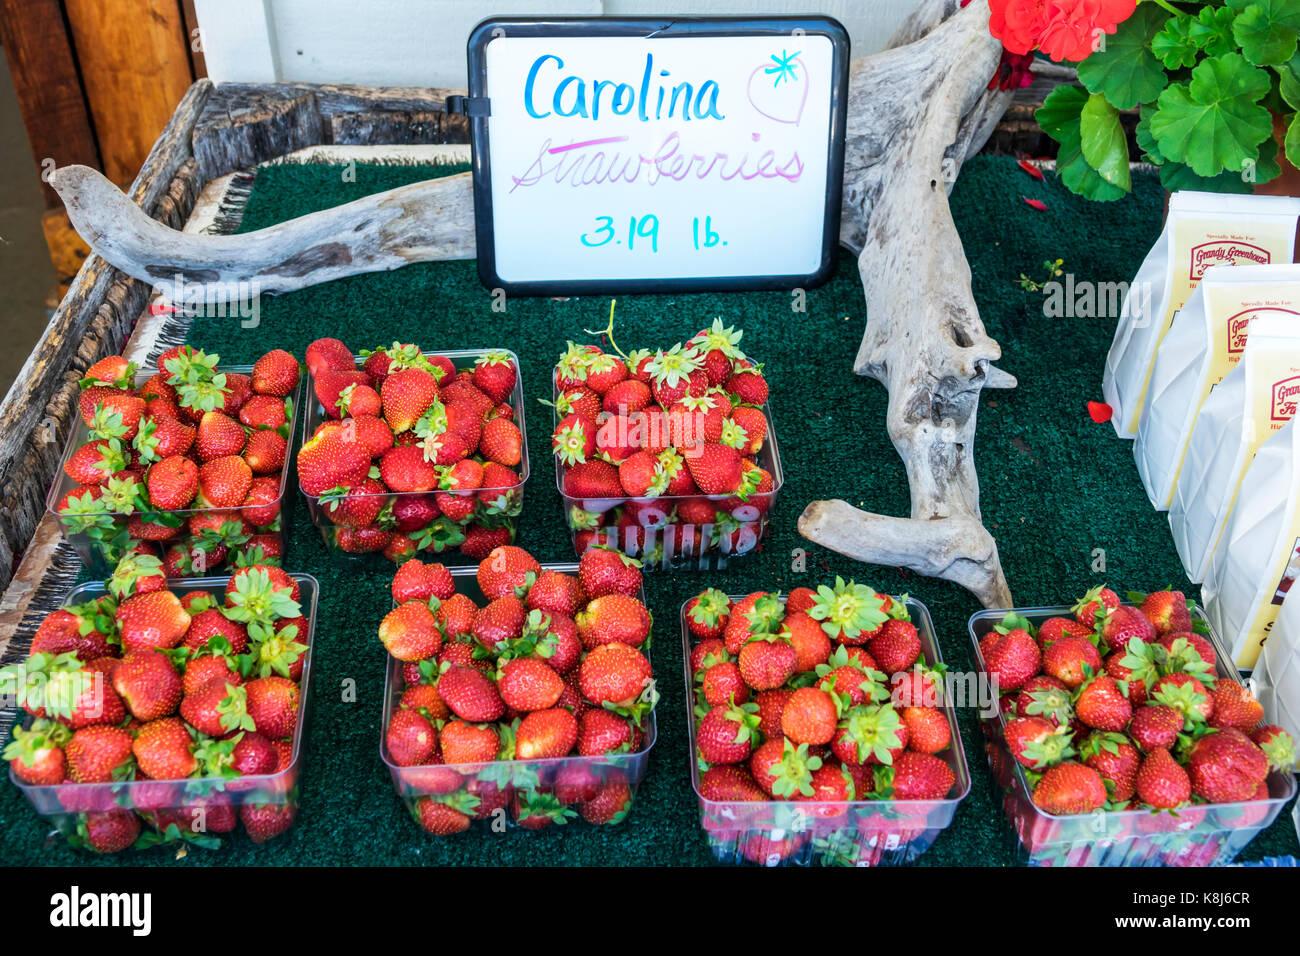 North Carolina NC Grandy Greenhouse & Farm Market fruit local strawberries display sale - Stock Image